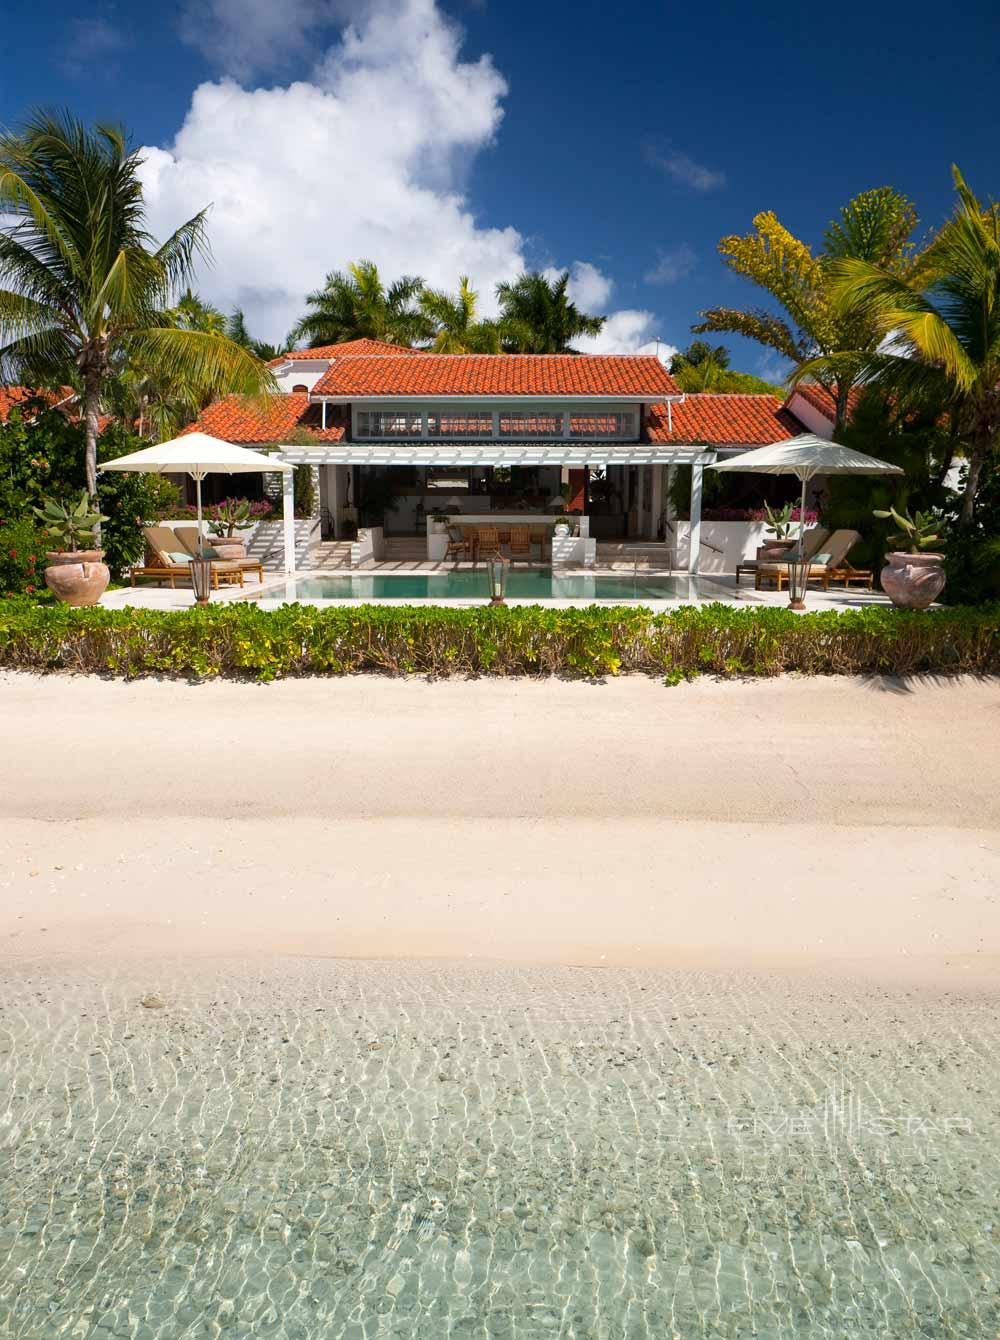 Jumby Bay sandy cove villaSt JohnsAntigua And Barbuda